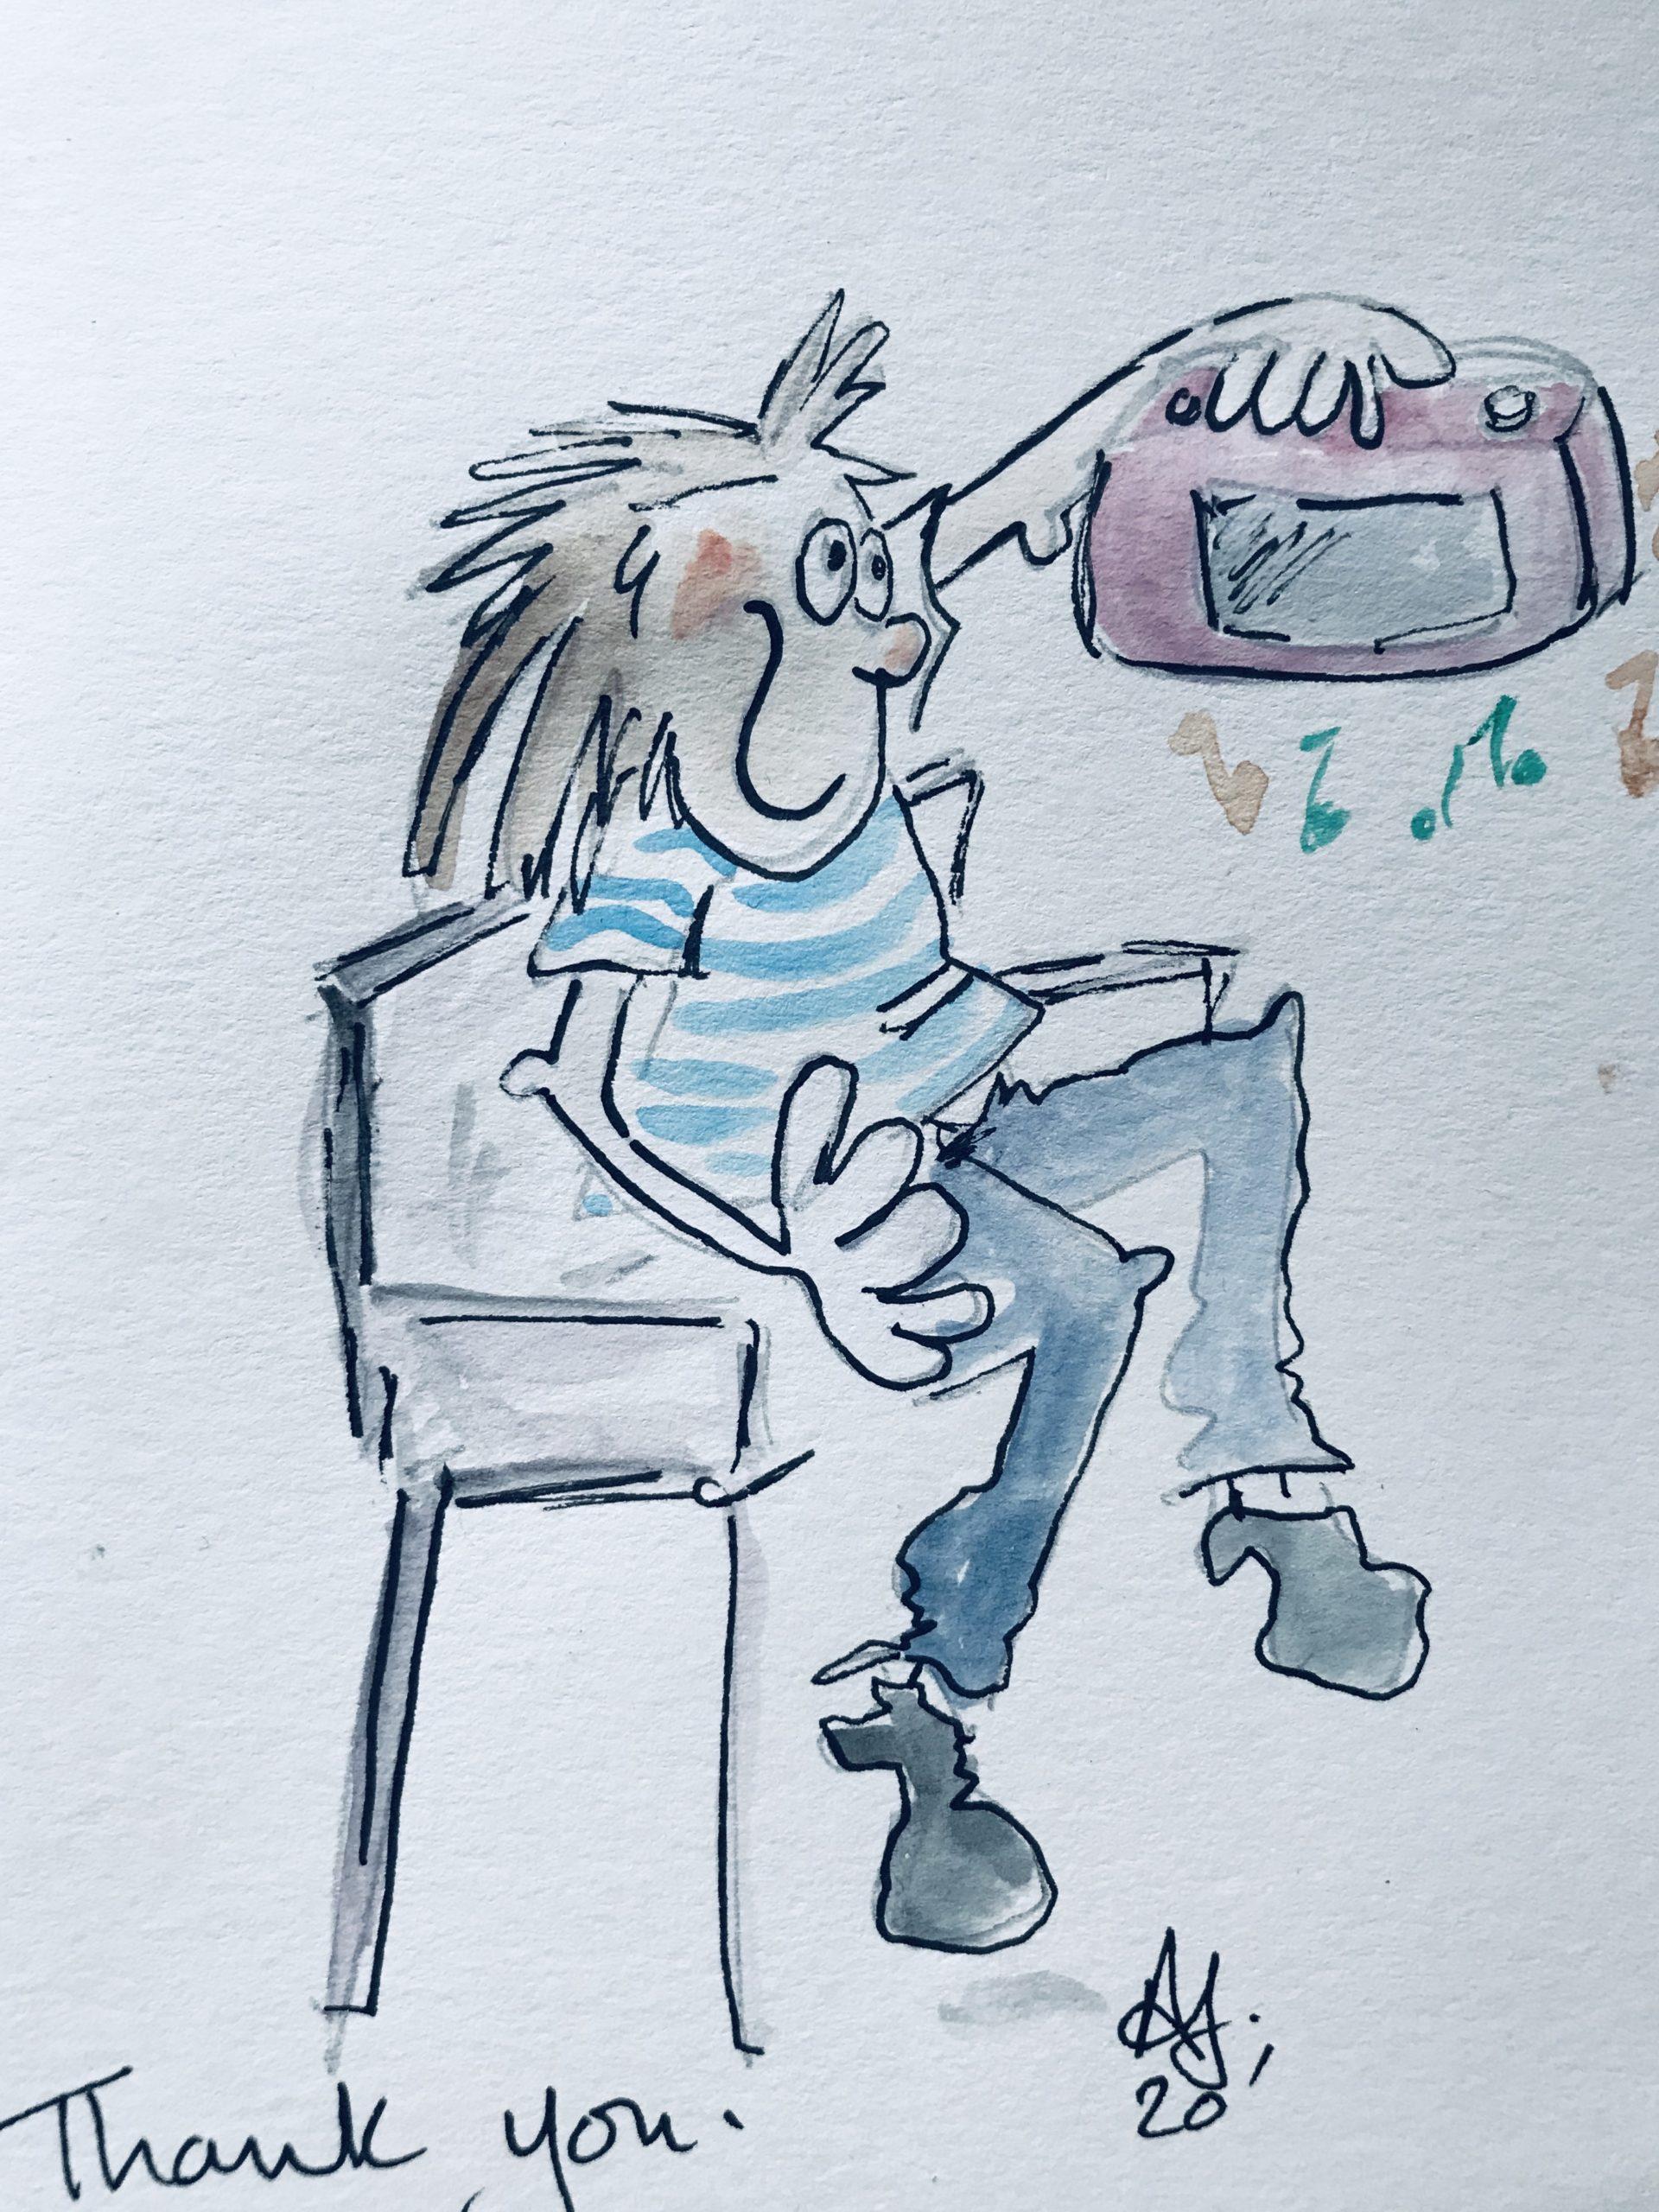 Radio repair cartoon image